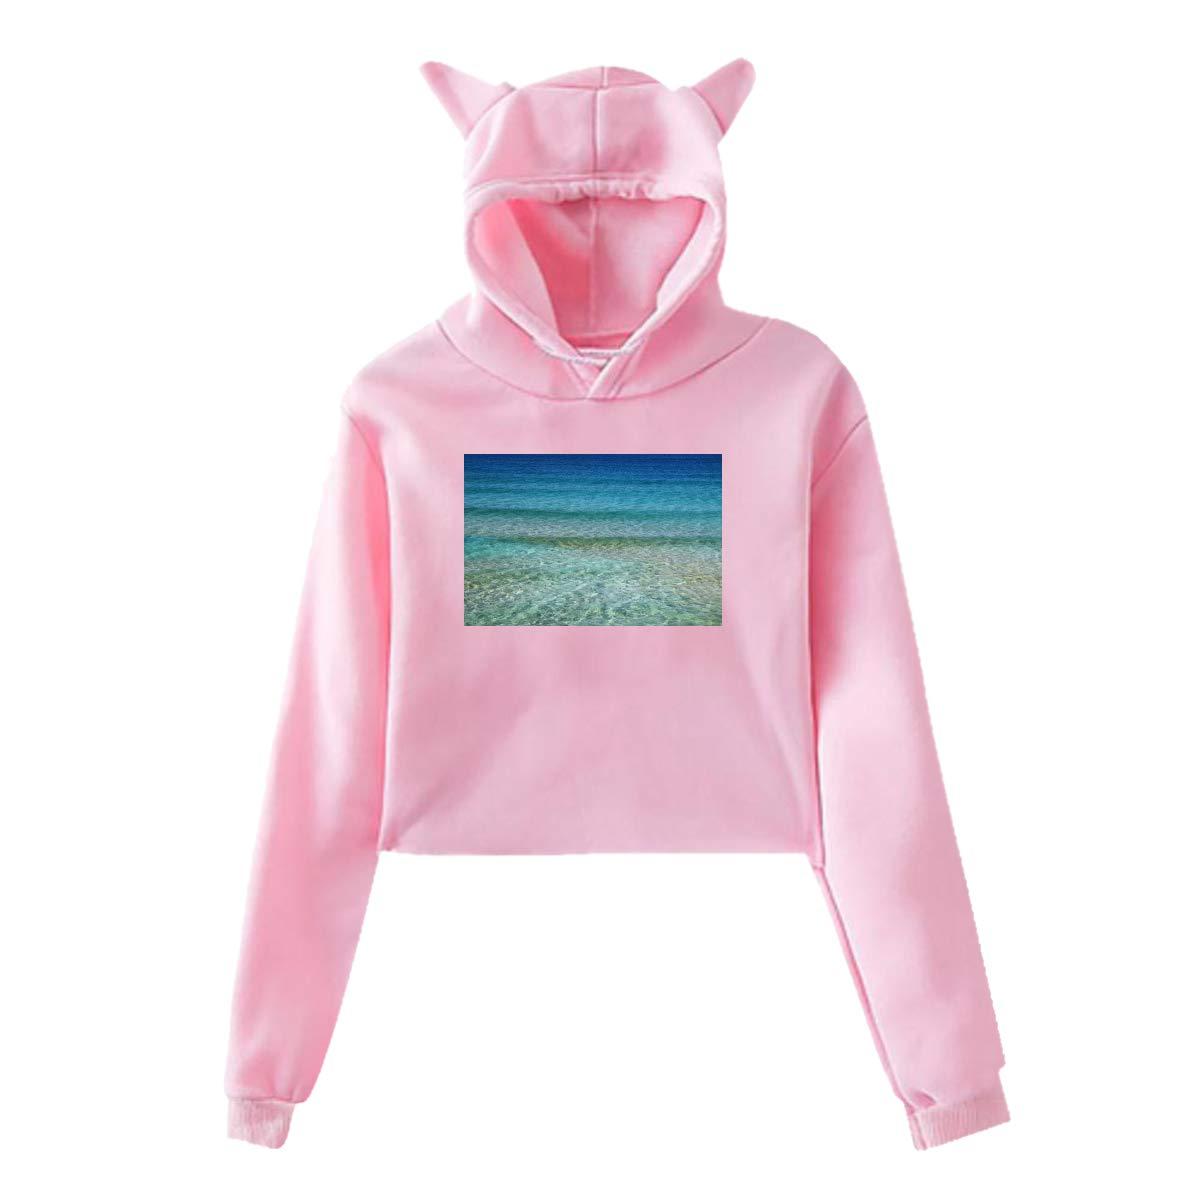 Personality Girl Cat Ears Umbilical Hoodie Fashion Sweatshirt Sweater Pink